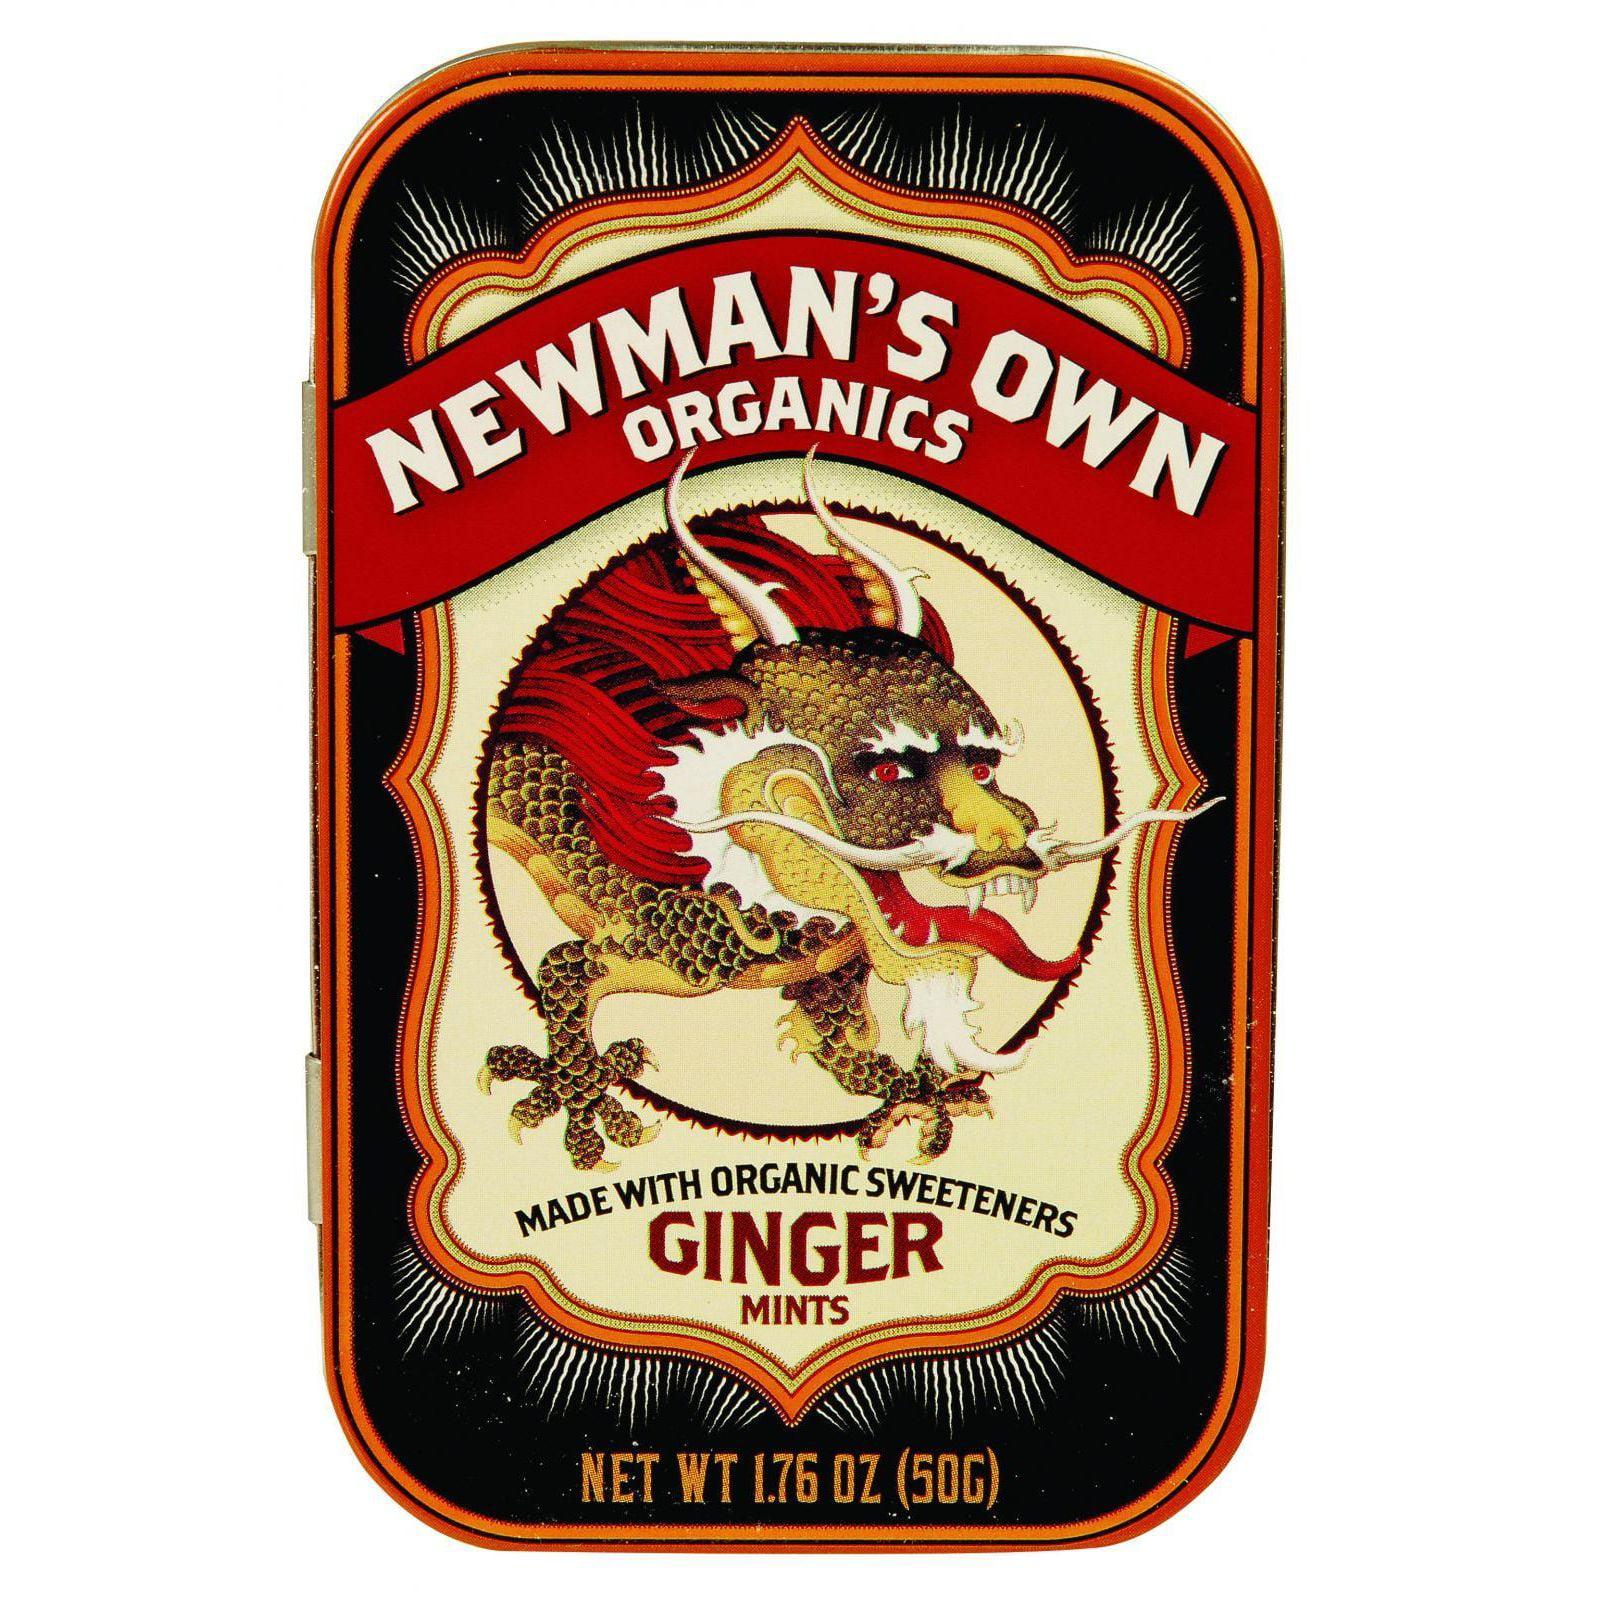 Newman's Own Organics Mints - Organic - Ginger - 1.65 oz ...